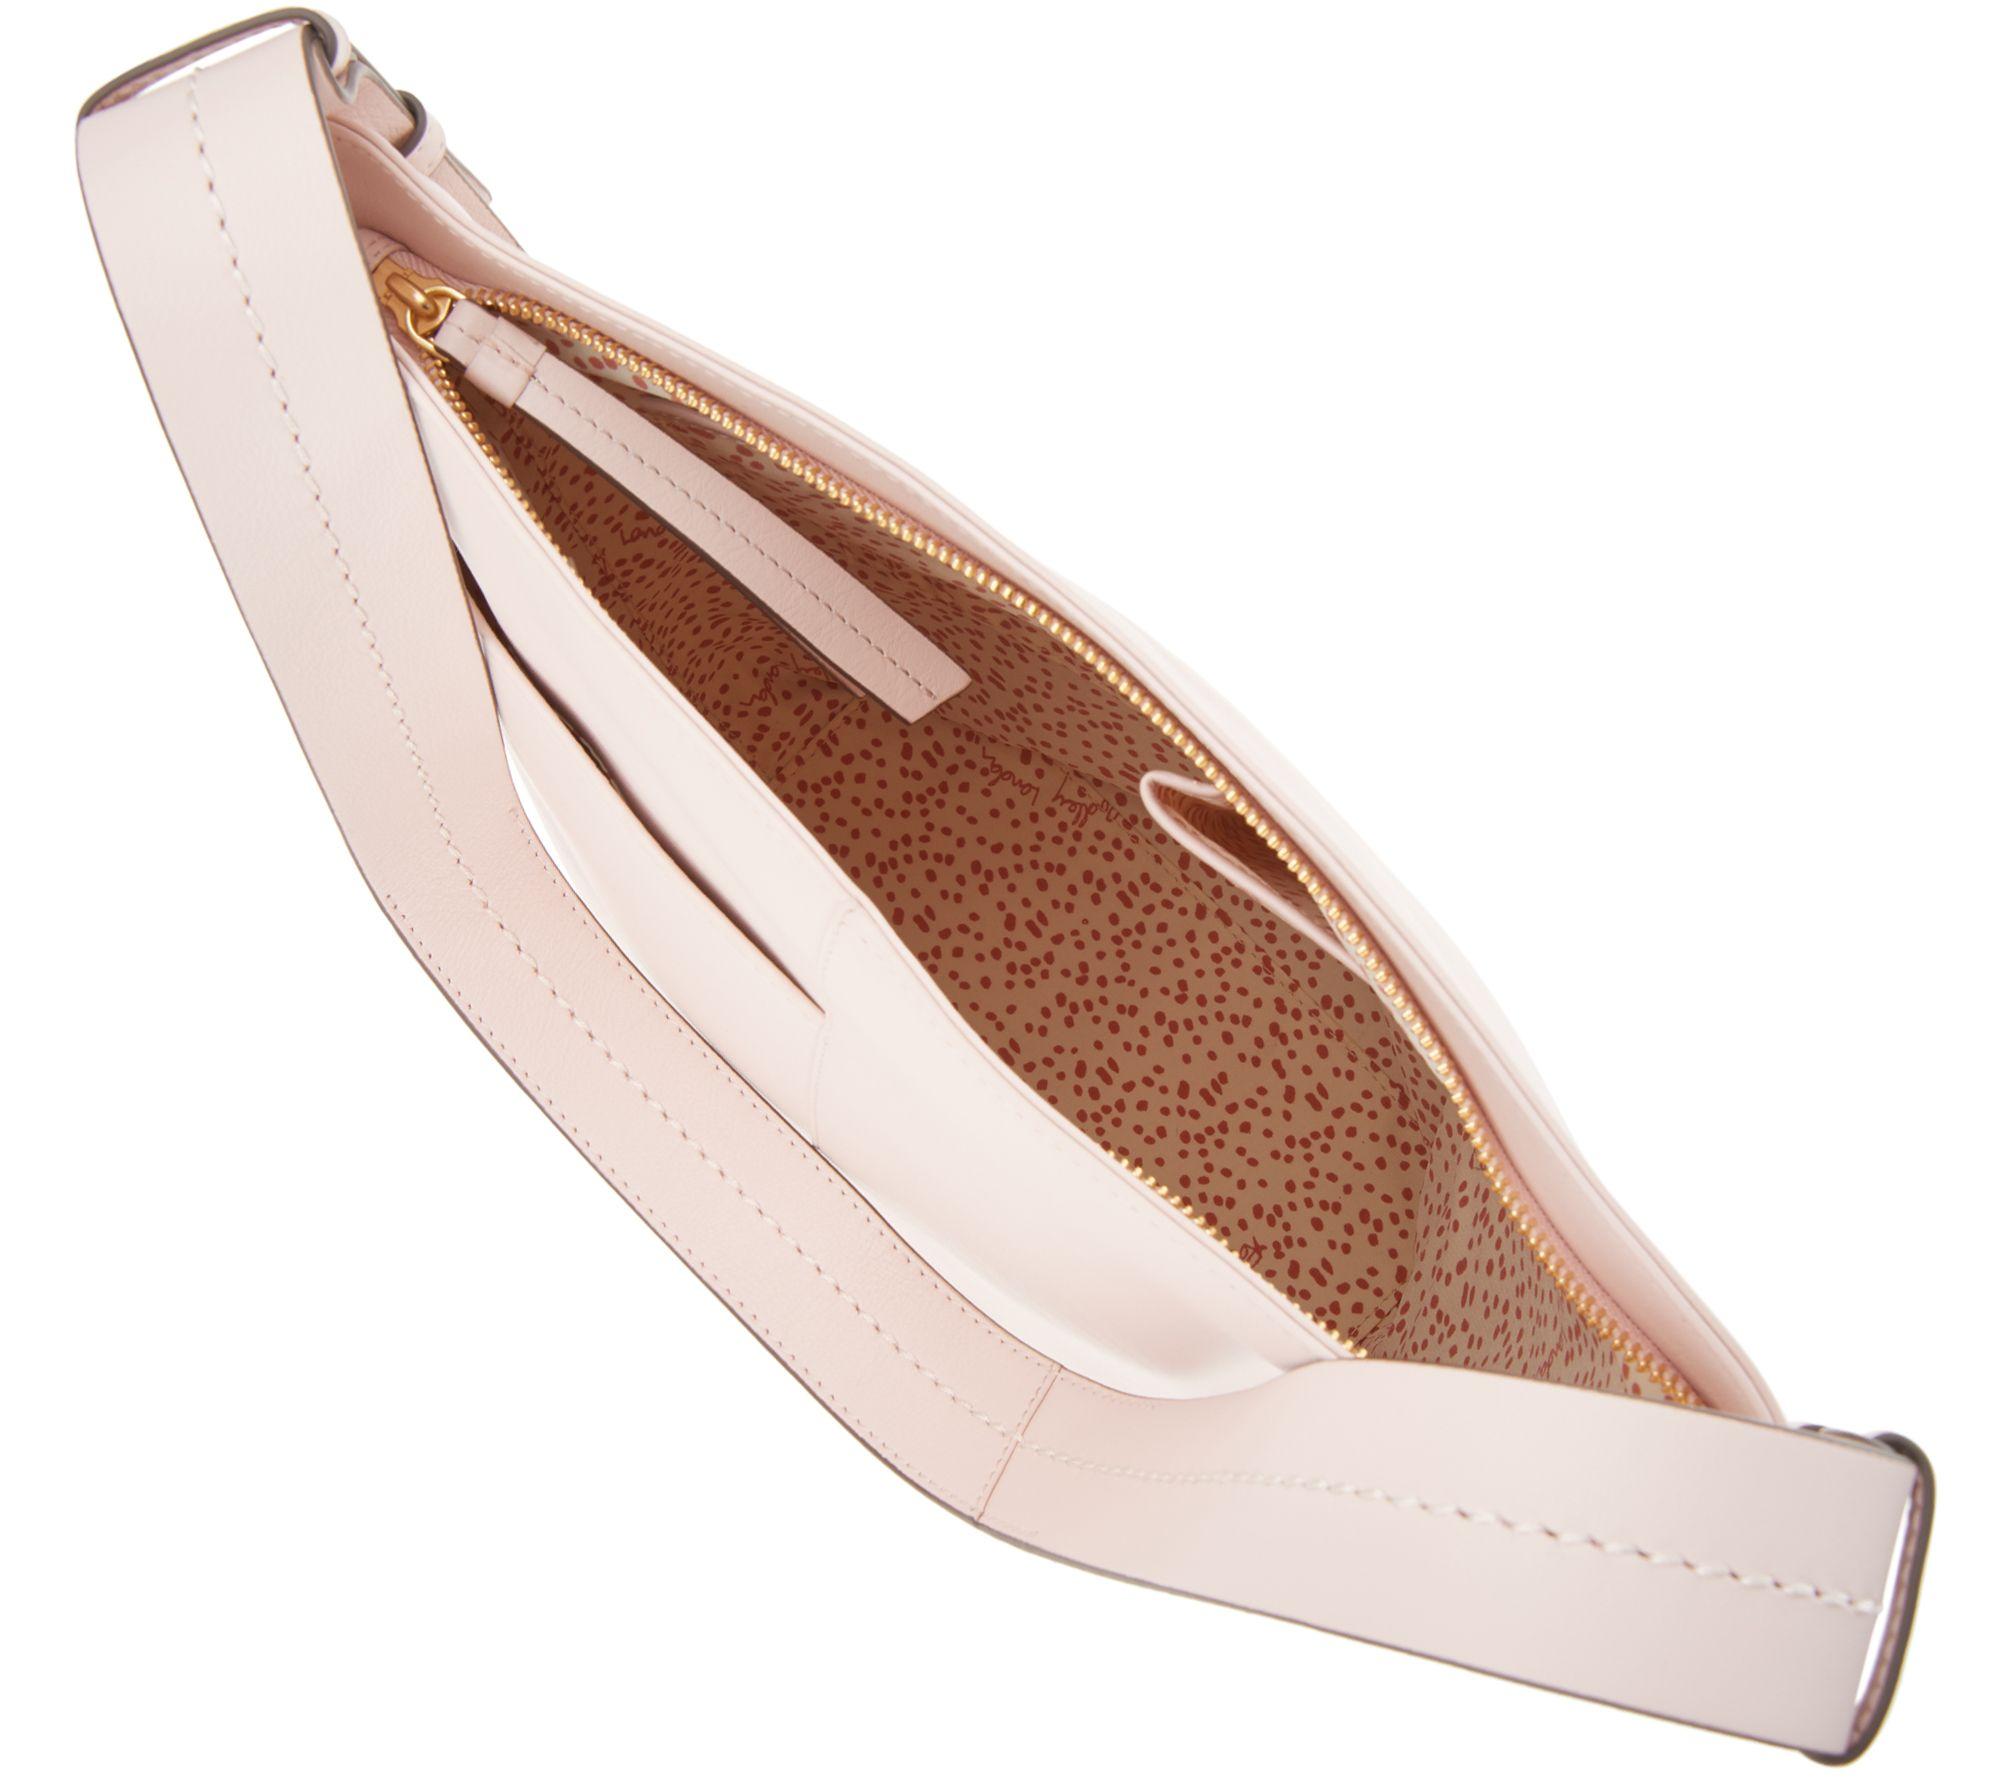 6385b3042d4 RADLEY London Finch Street Leather Large Bucket Hobo Handbag - Page 1 —  QVC.com